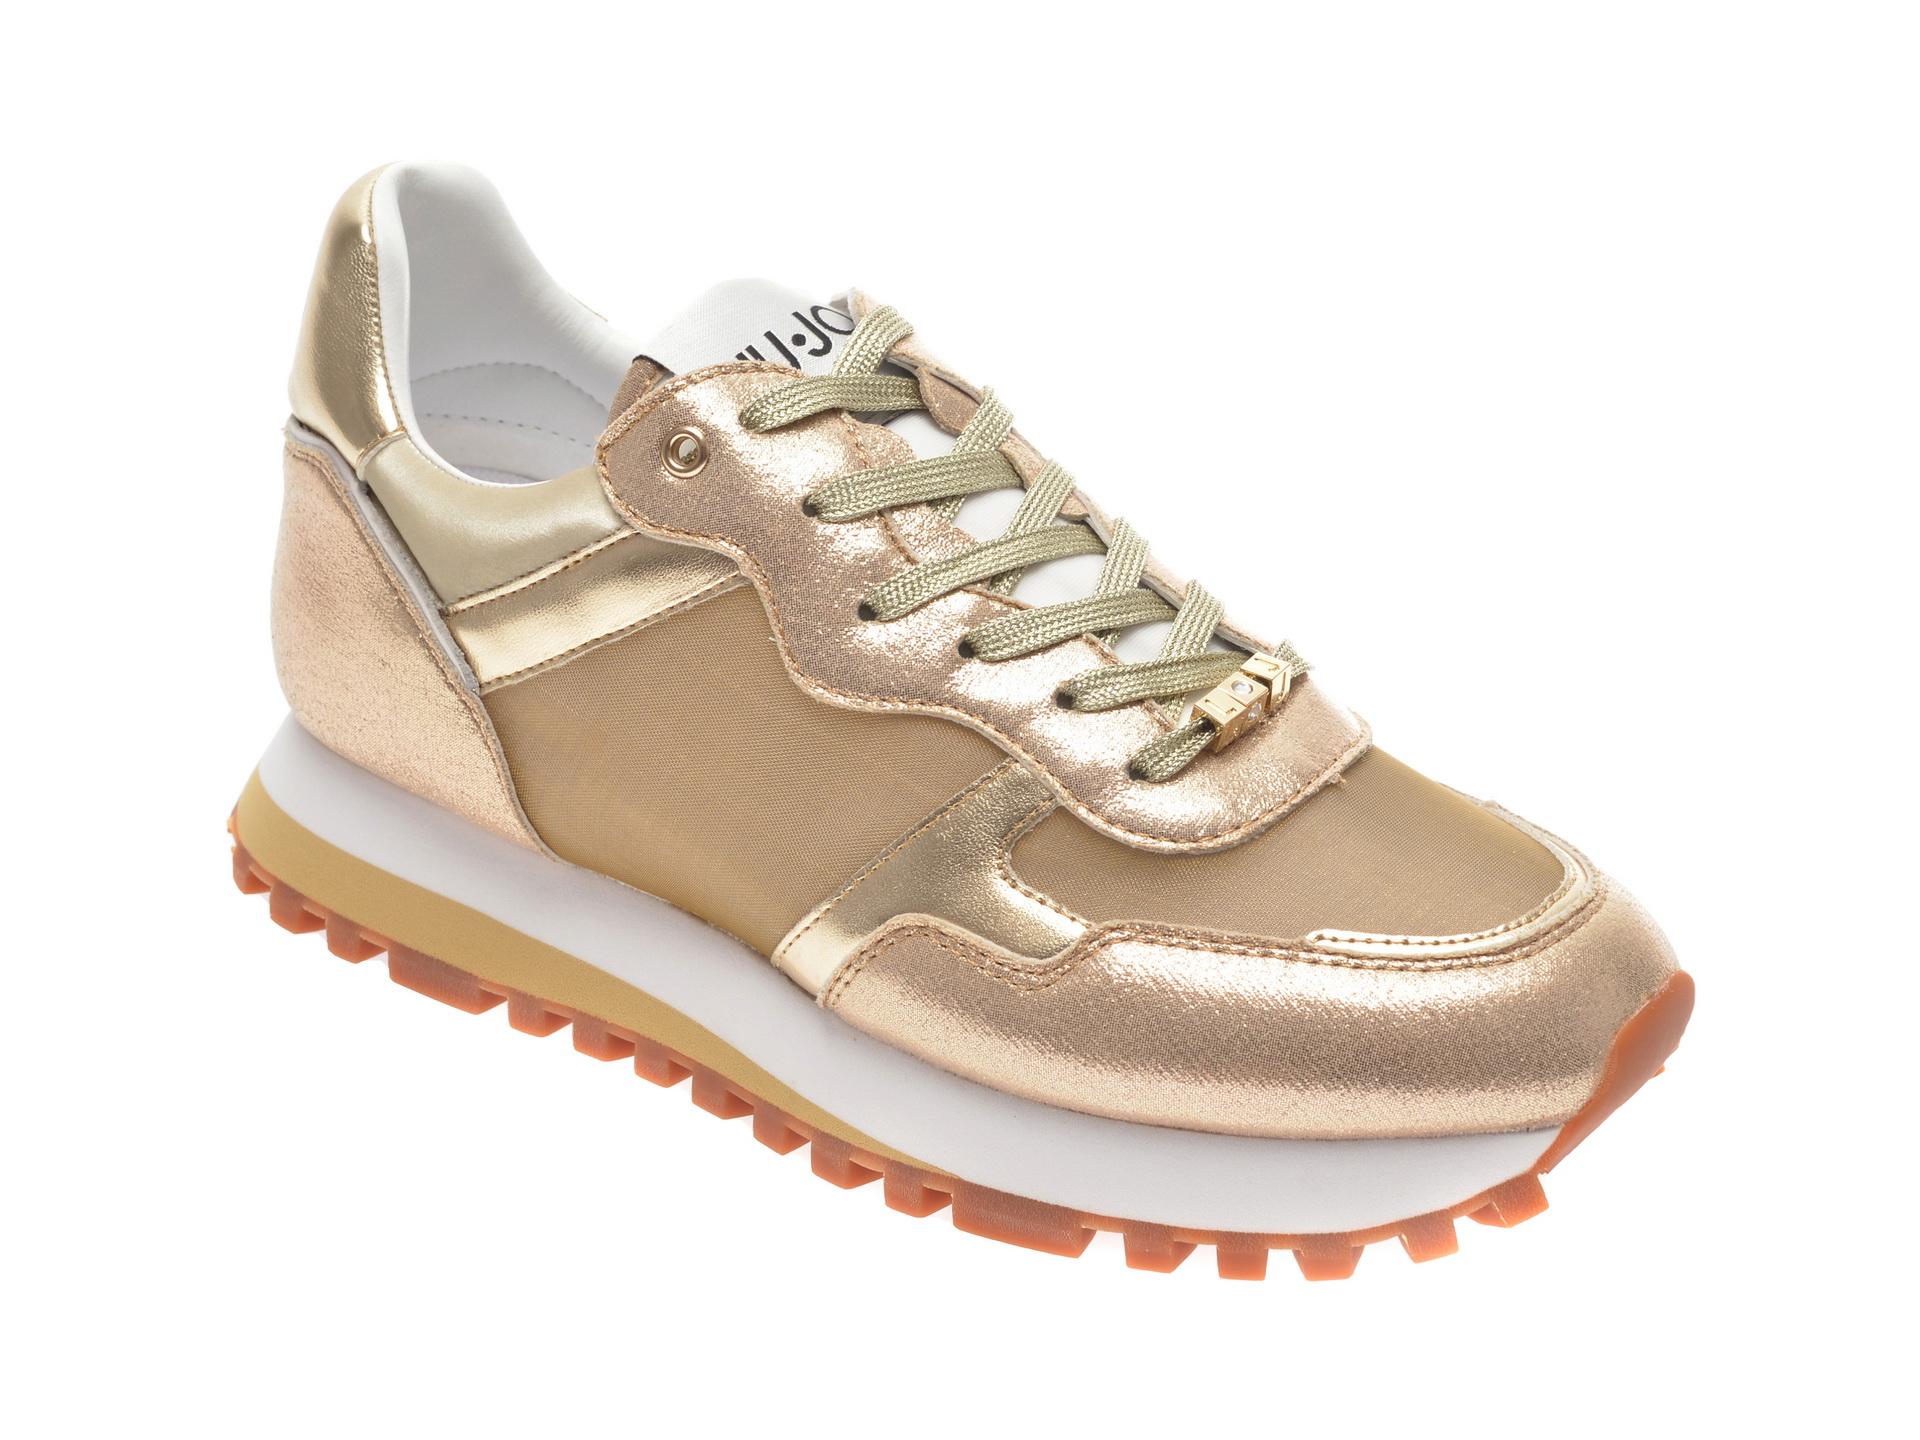 Pantofi sport LIU JO aurii, WONDER, din material textil si piele ecologica